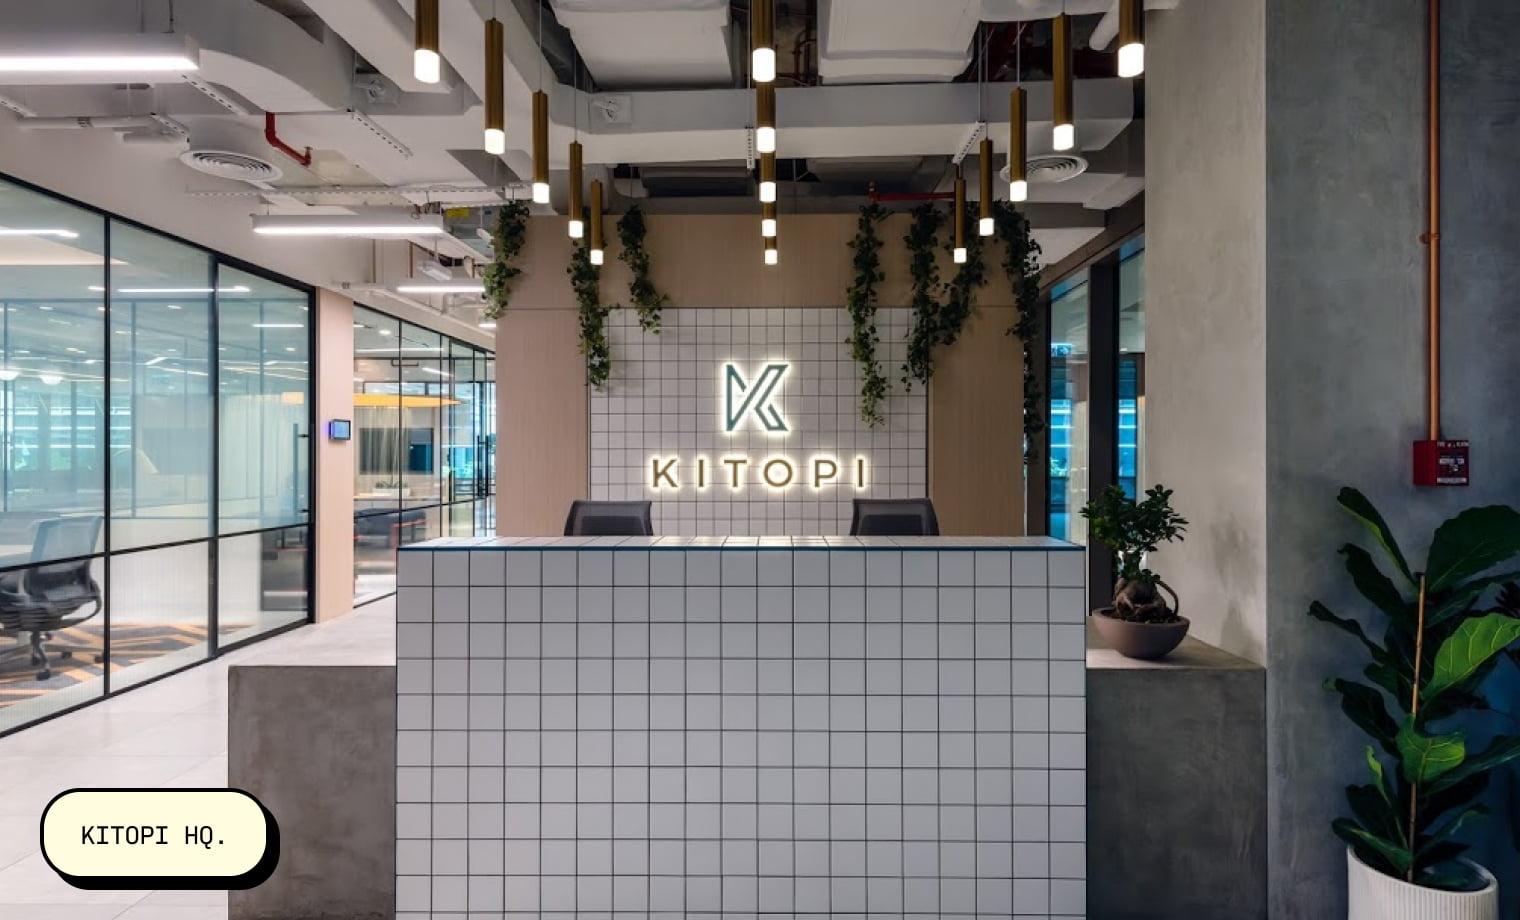 Kitopi HQ. Image source: The Spoon